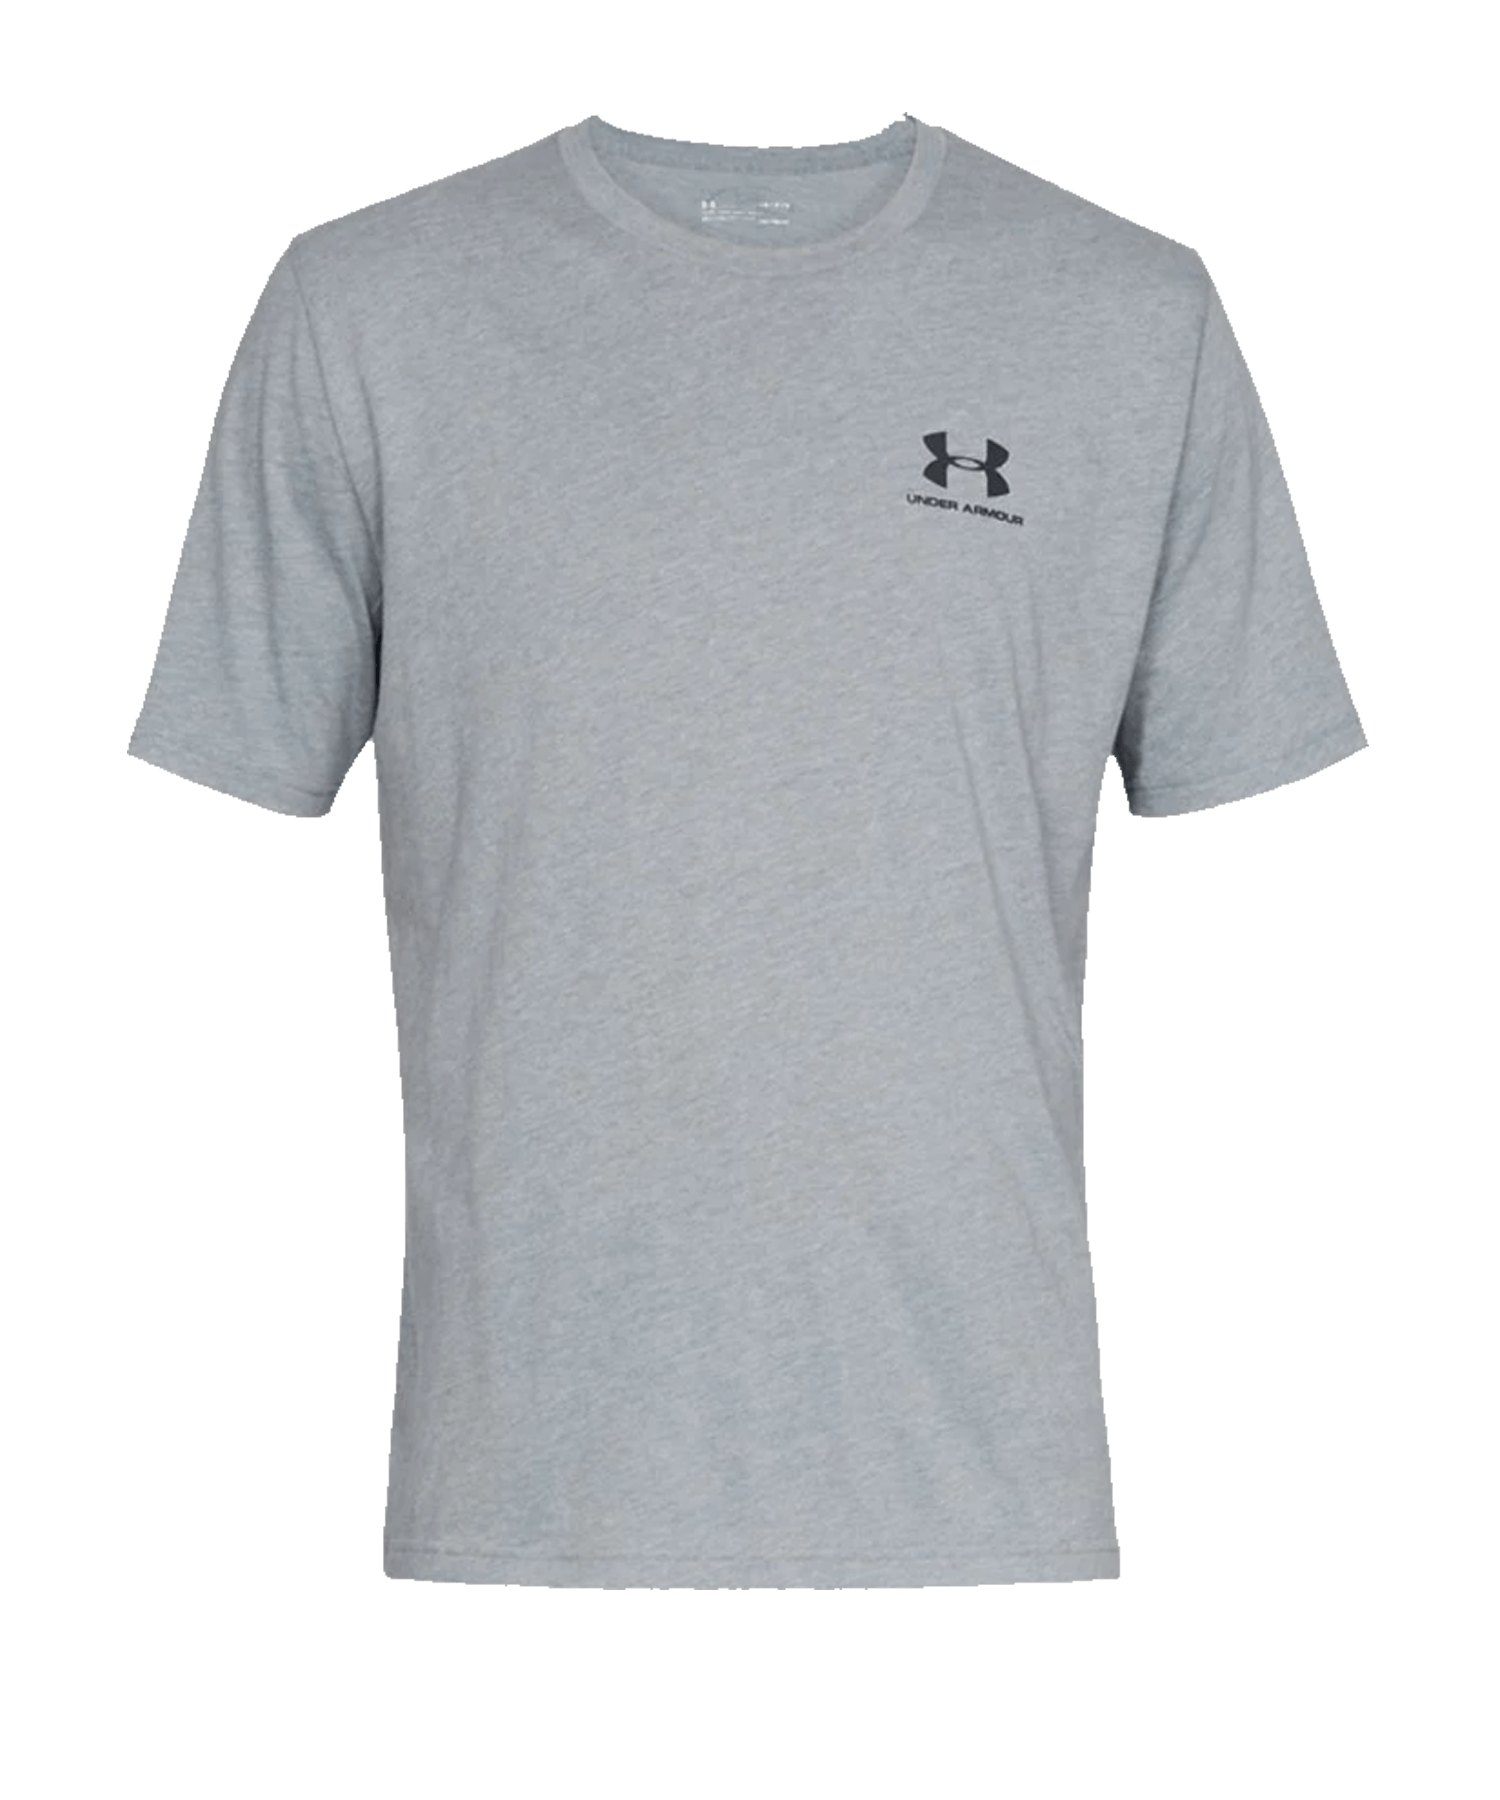 Under Armour Sportstyle Left Chest T-Shirt F036 - grau